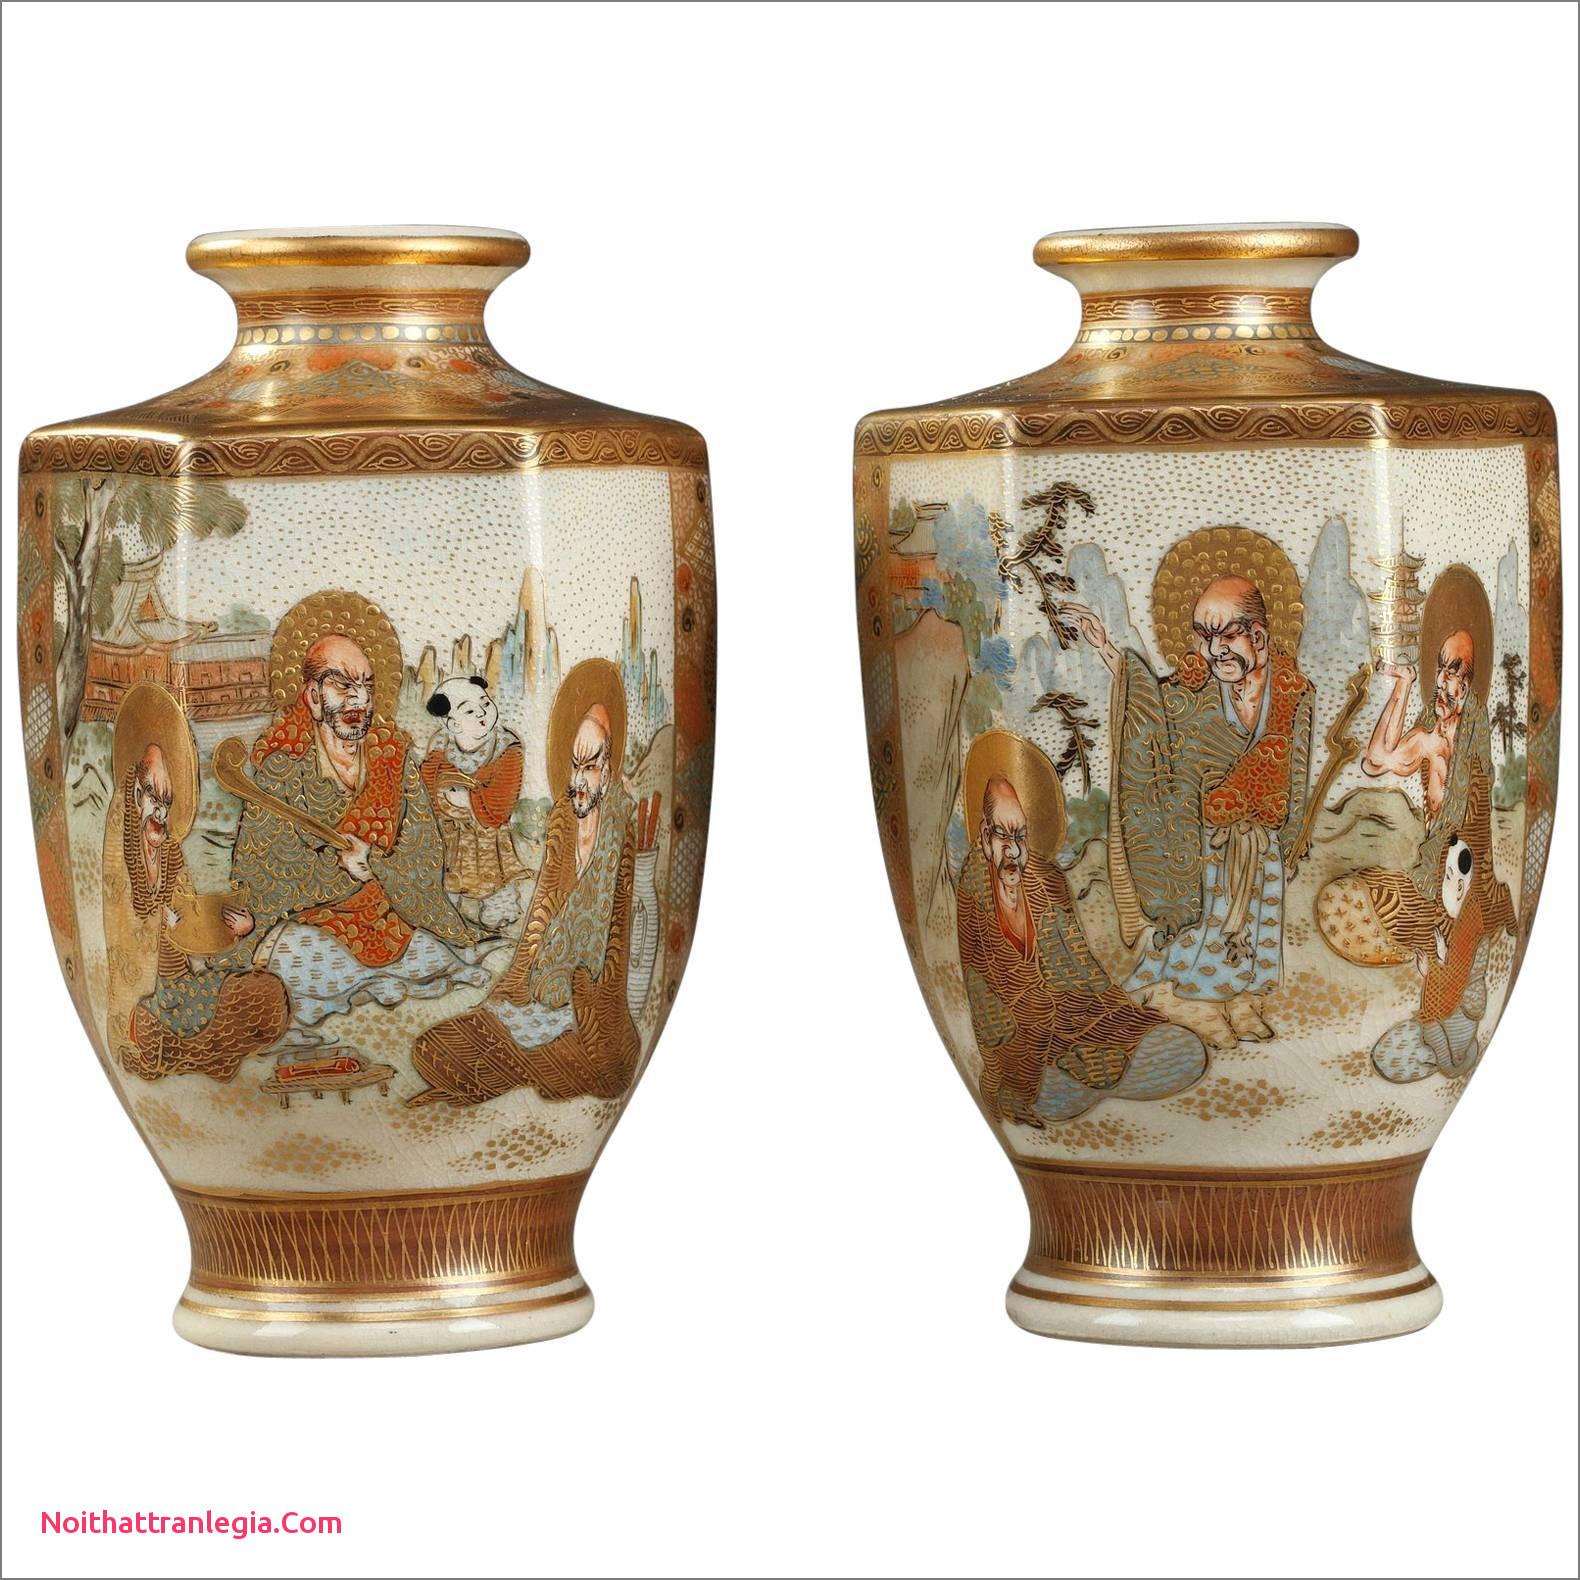 chinese porcelain vase of 20 chinese antique vase noithattranlegia vases design throughout chinese ginger jar table lamps elegant pair 20th century general porcelain trenton nj usa industrial